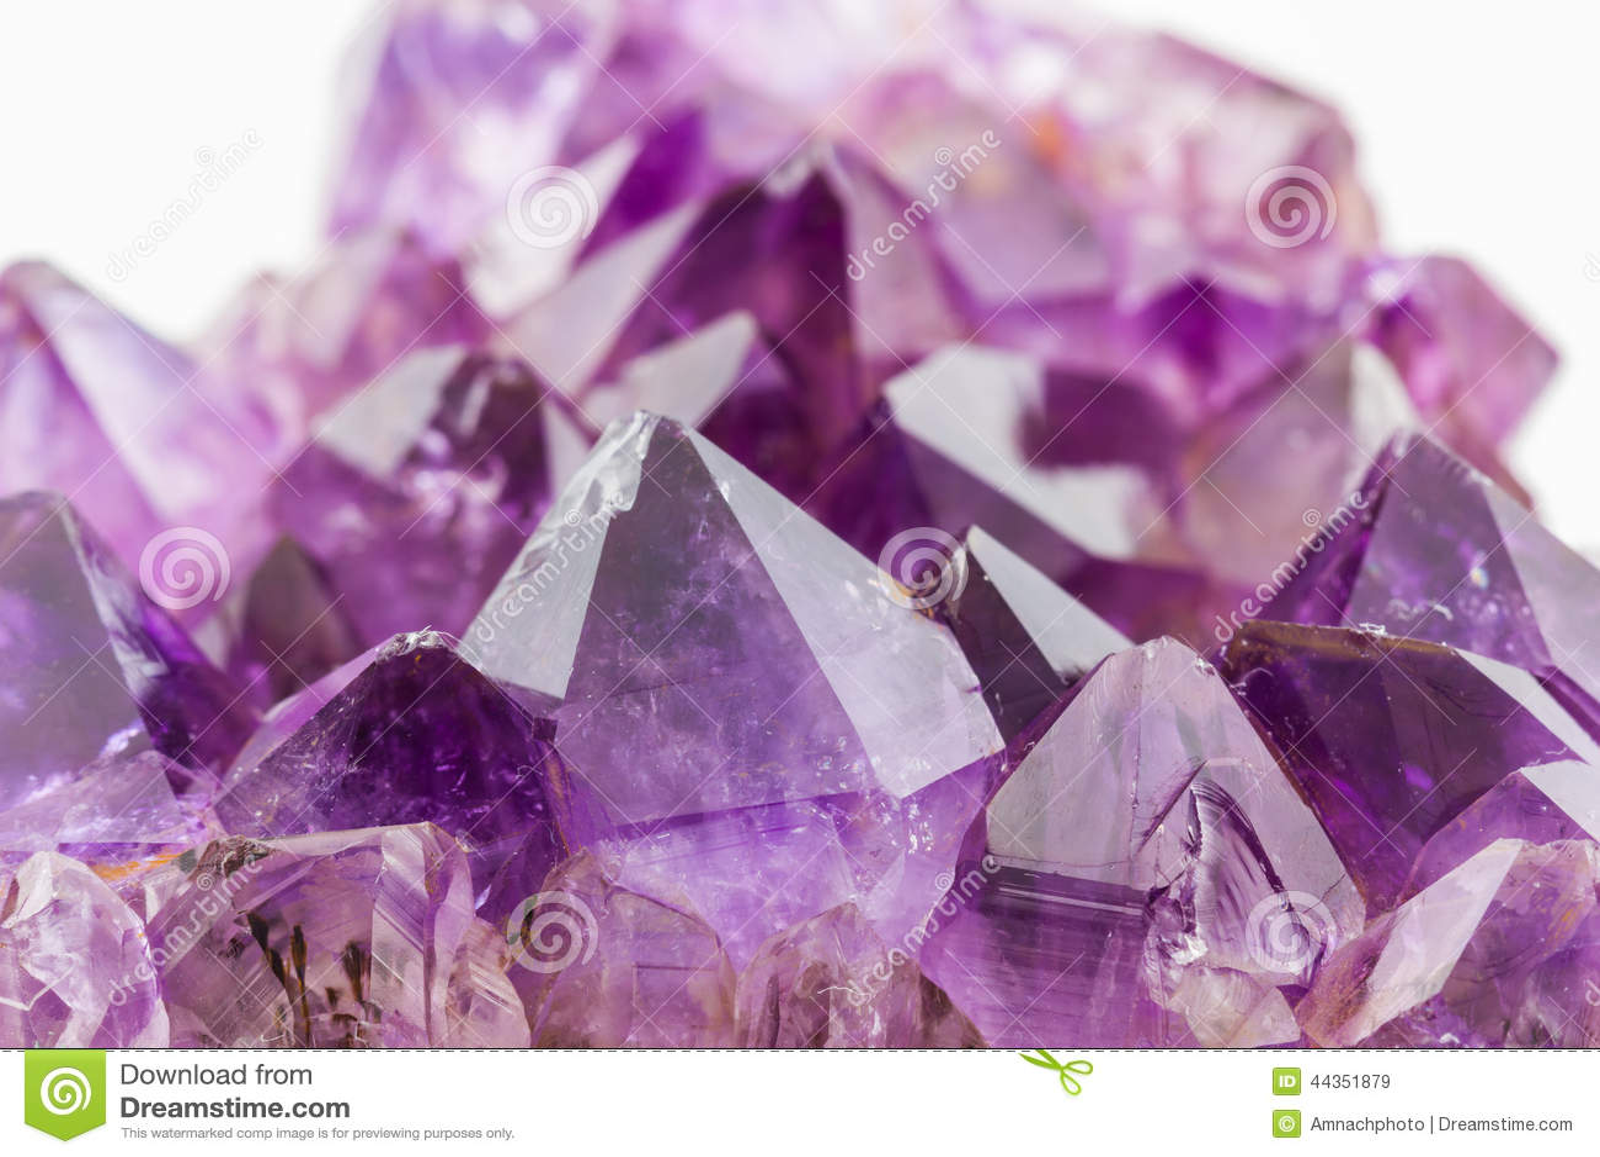 Crystal Stone, cristalli ametisti ruvidi porpora